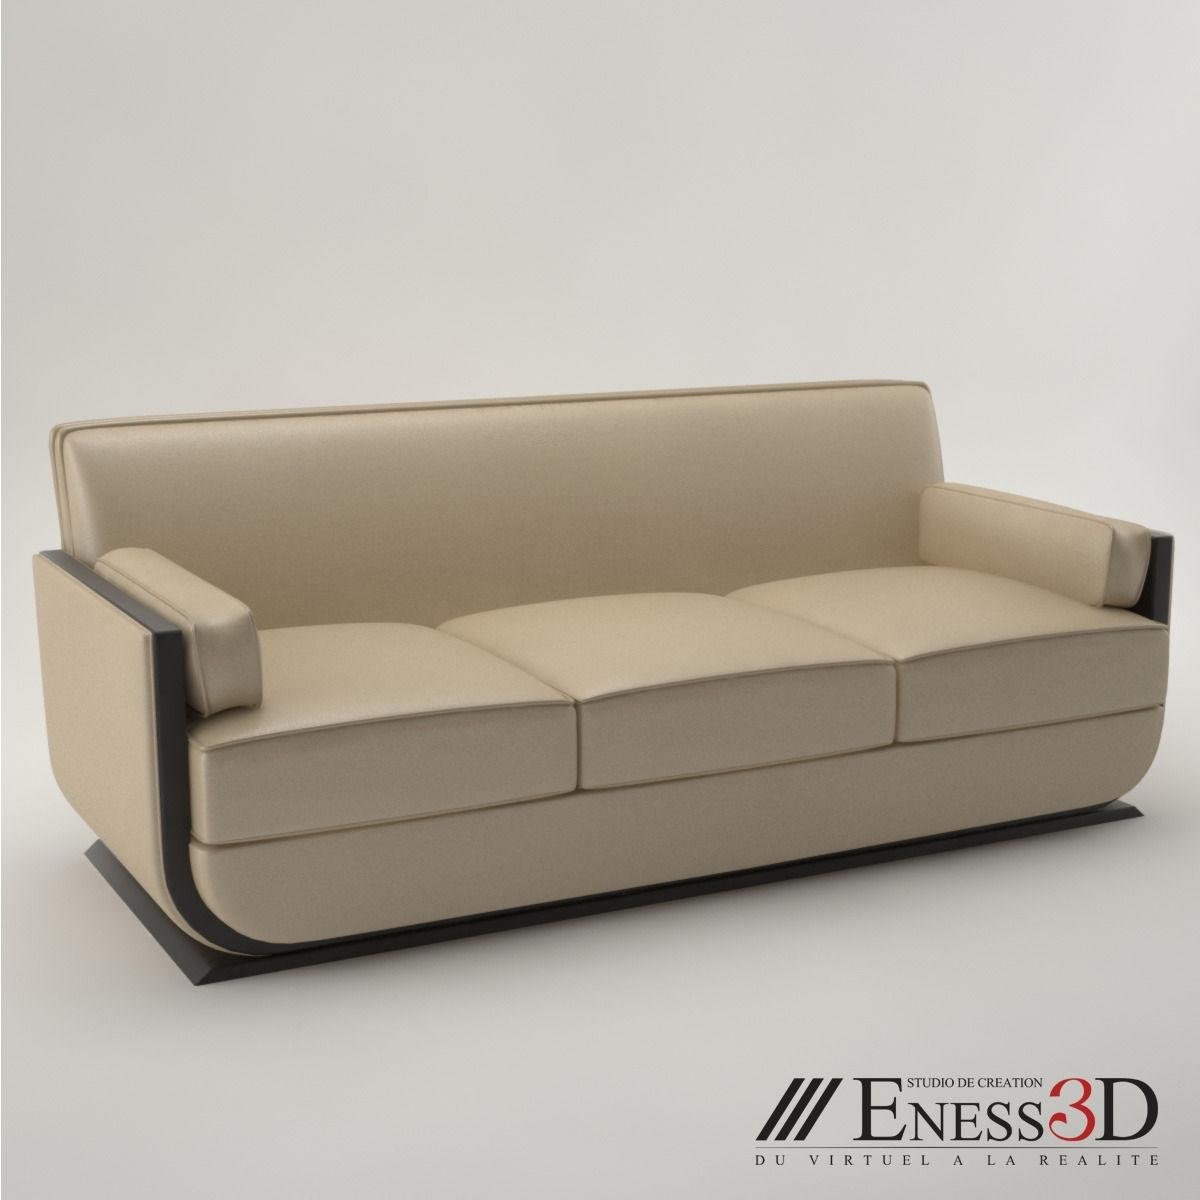 Fantastic Art Deco Sofa 43 About Remodel Contemporary Sofa in Art Deco Sofas (Image 7 of 10)